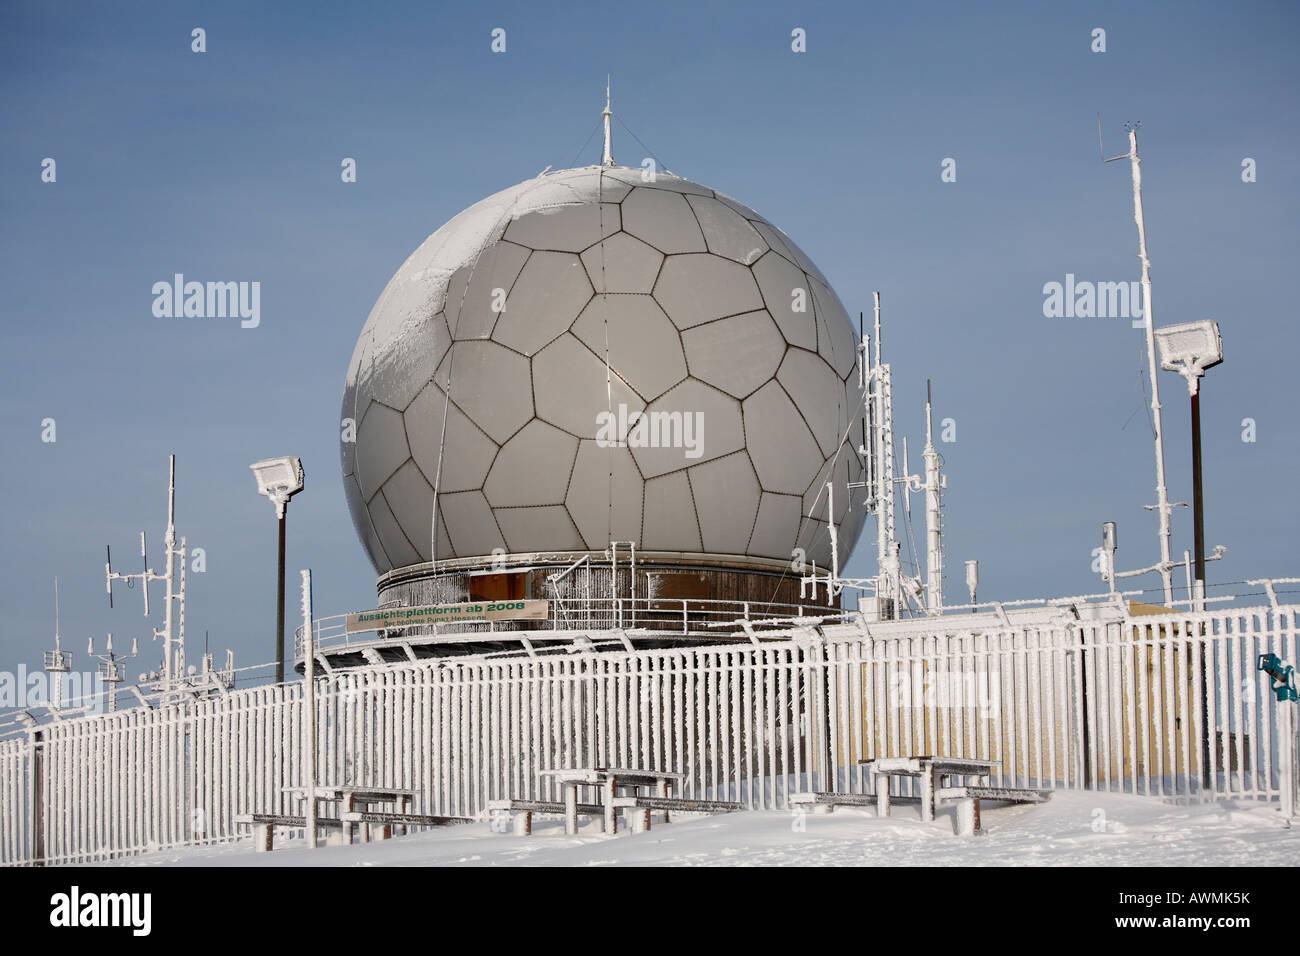 Radar dome (radome), Mt. Wasserkruppe, Rhoen Mountains, Hesse, Germany, Europe Stock Photo